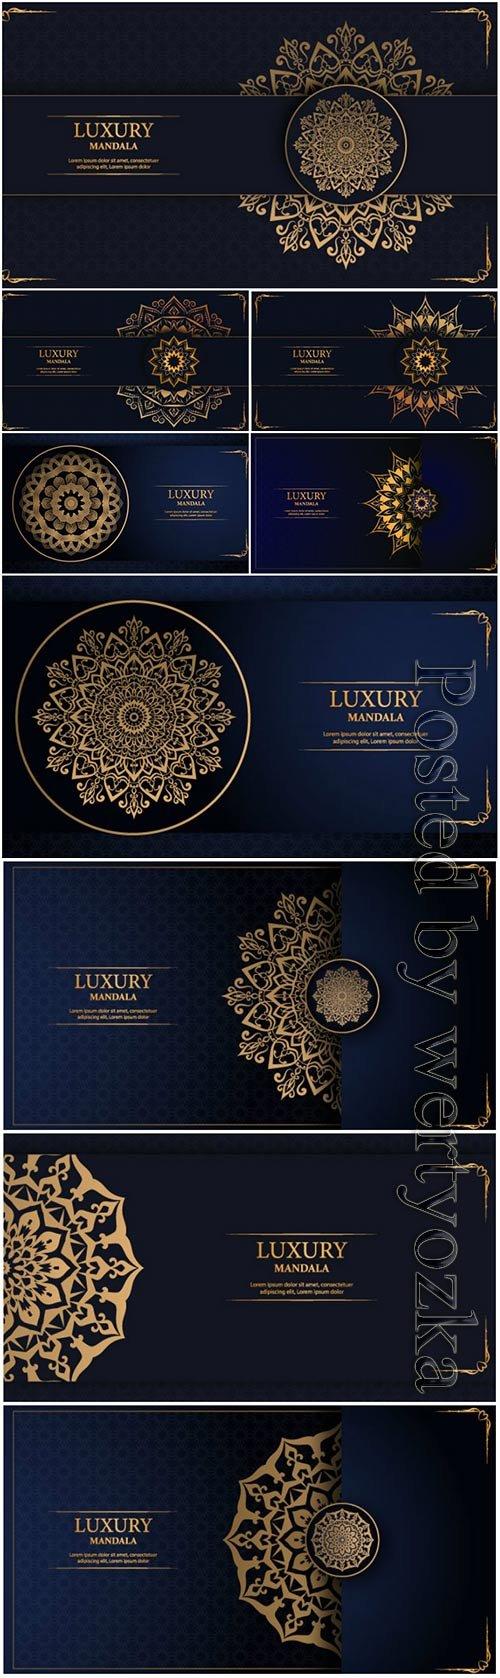 Luxury mandala arabesque ornamental vector background